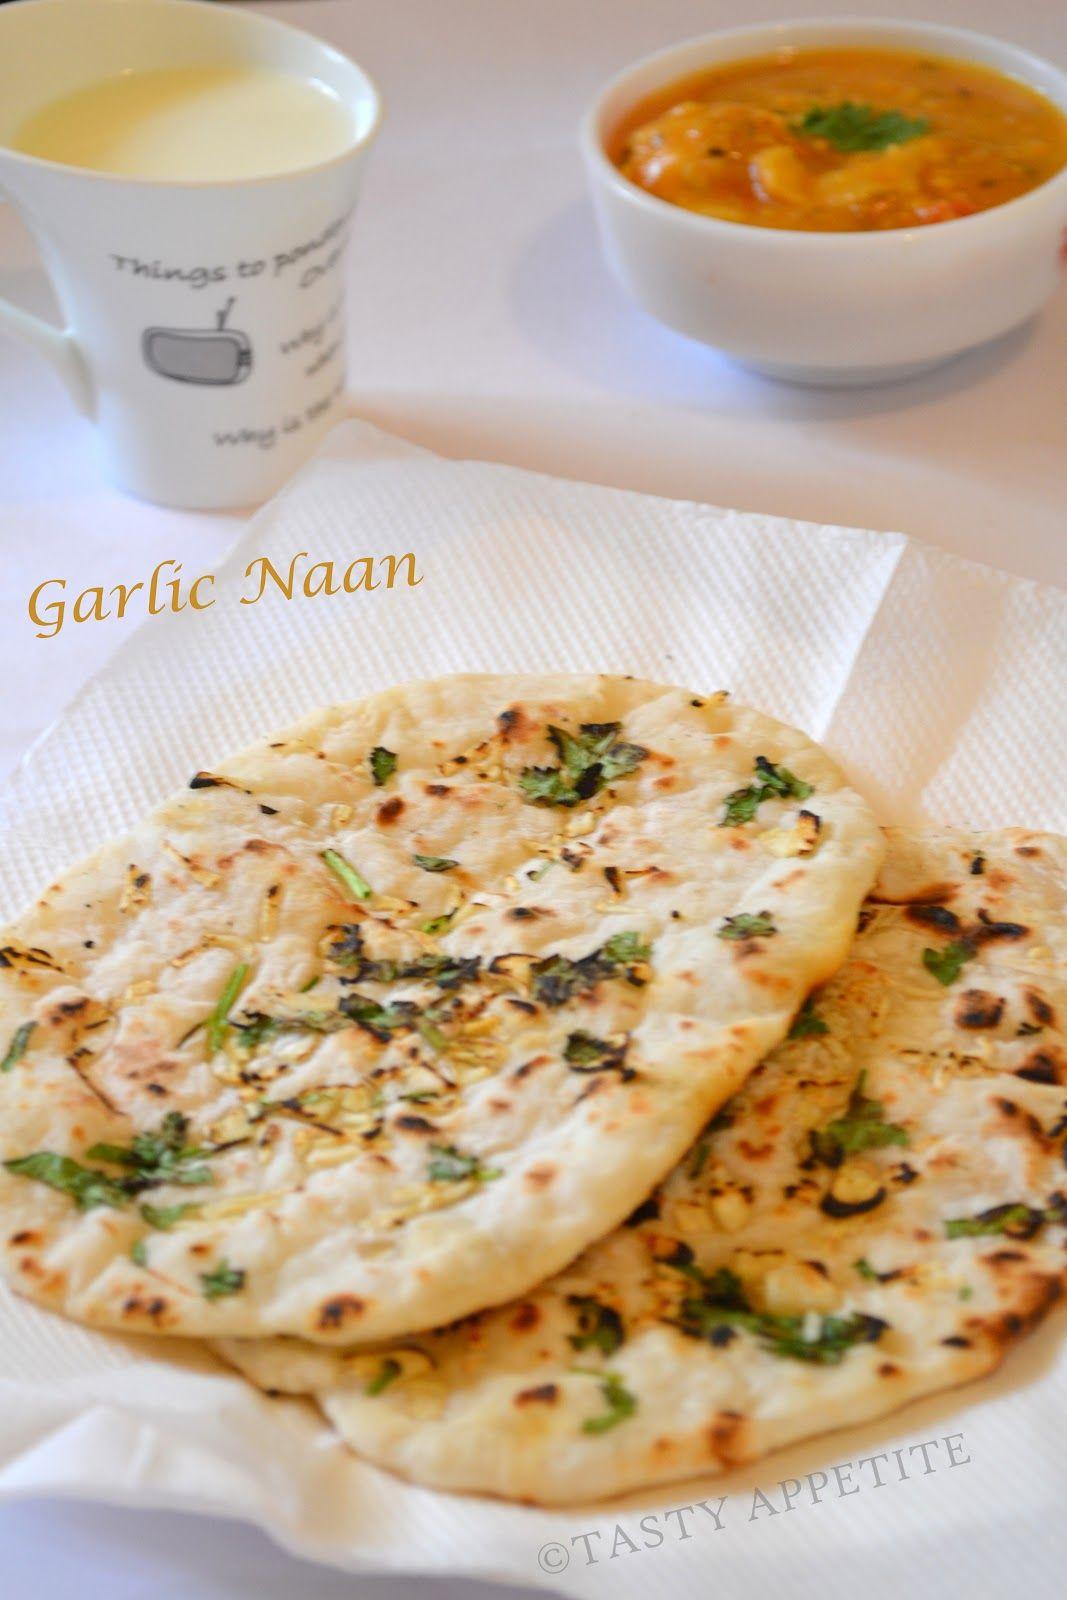 Garlic naan yeast free like us on youtube for more video recipes garlic naan yeast free like us on youtube for more video recipes garlic naan forumfinder Choice Image